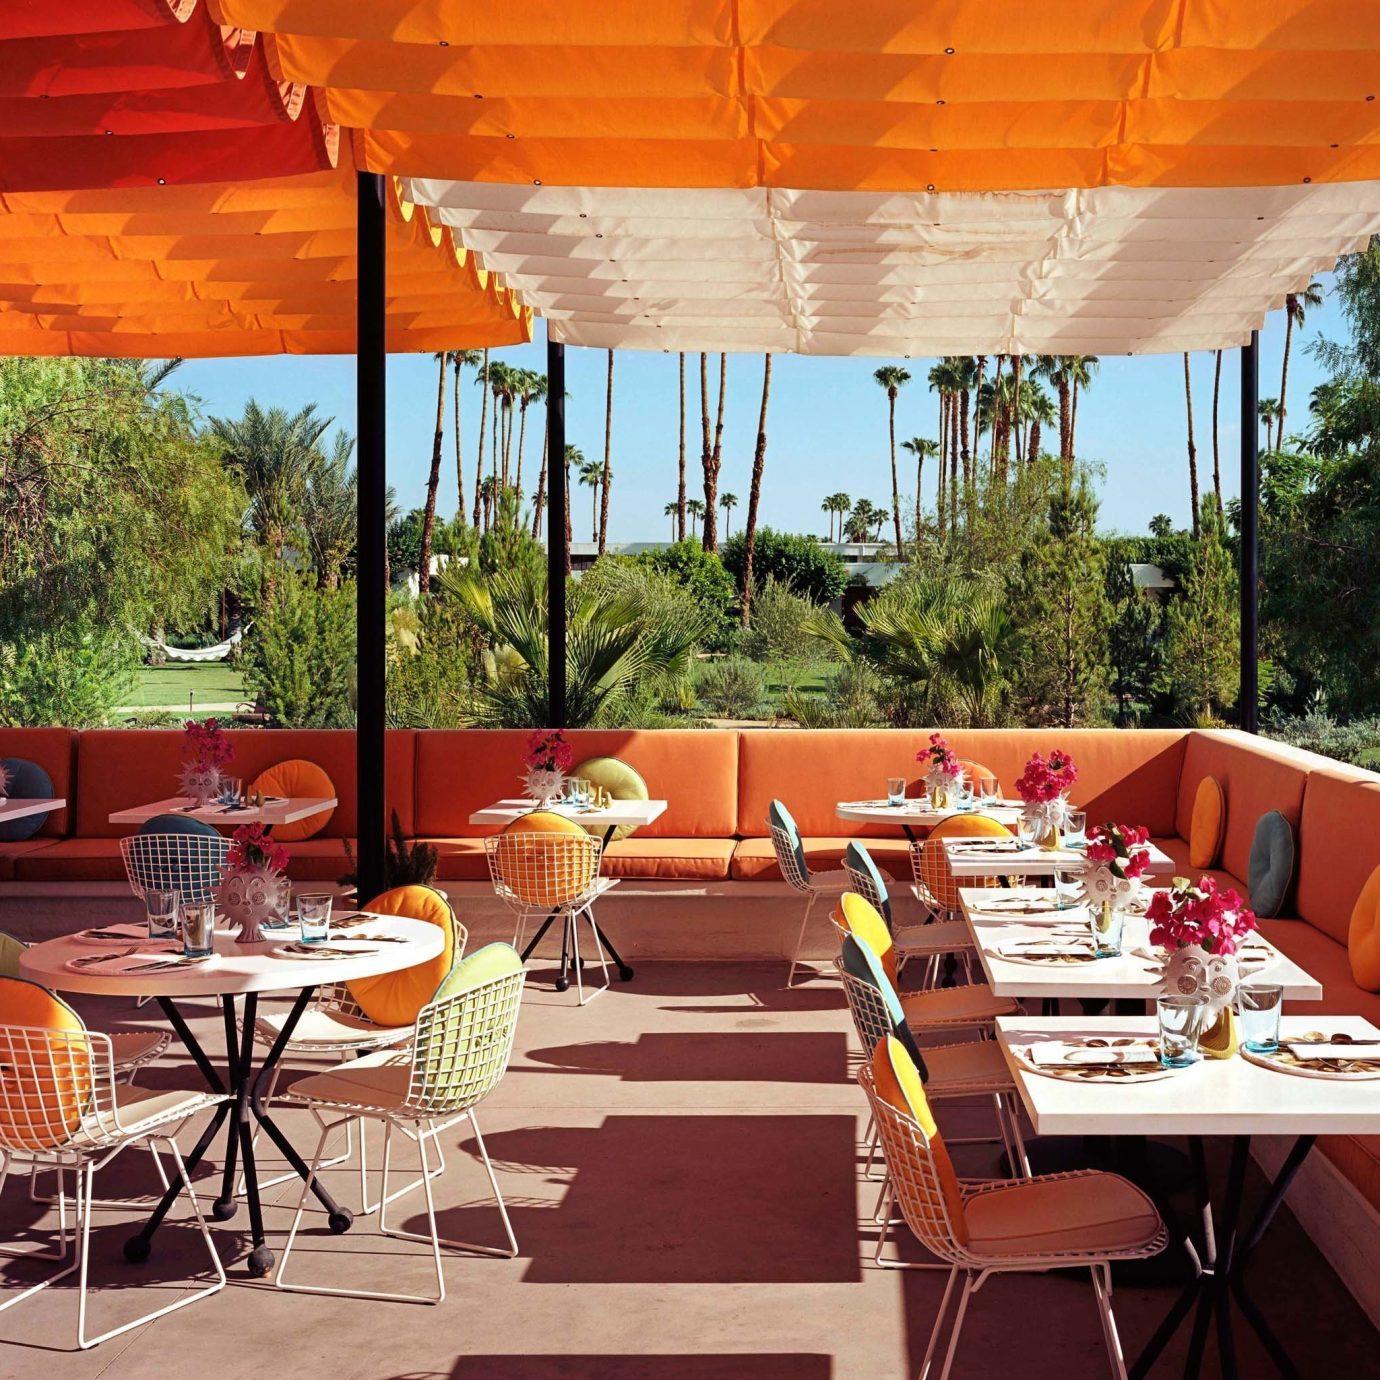 tree umbrella chair restaurant Dining Resort function hall orange set